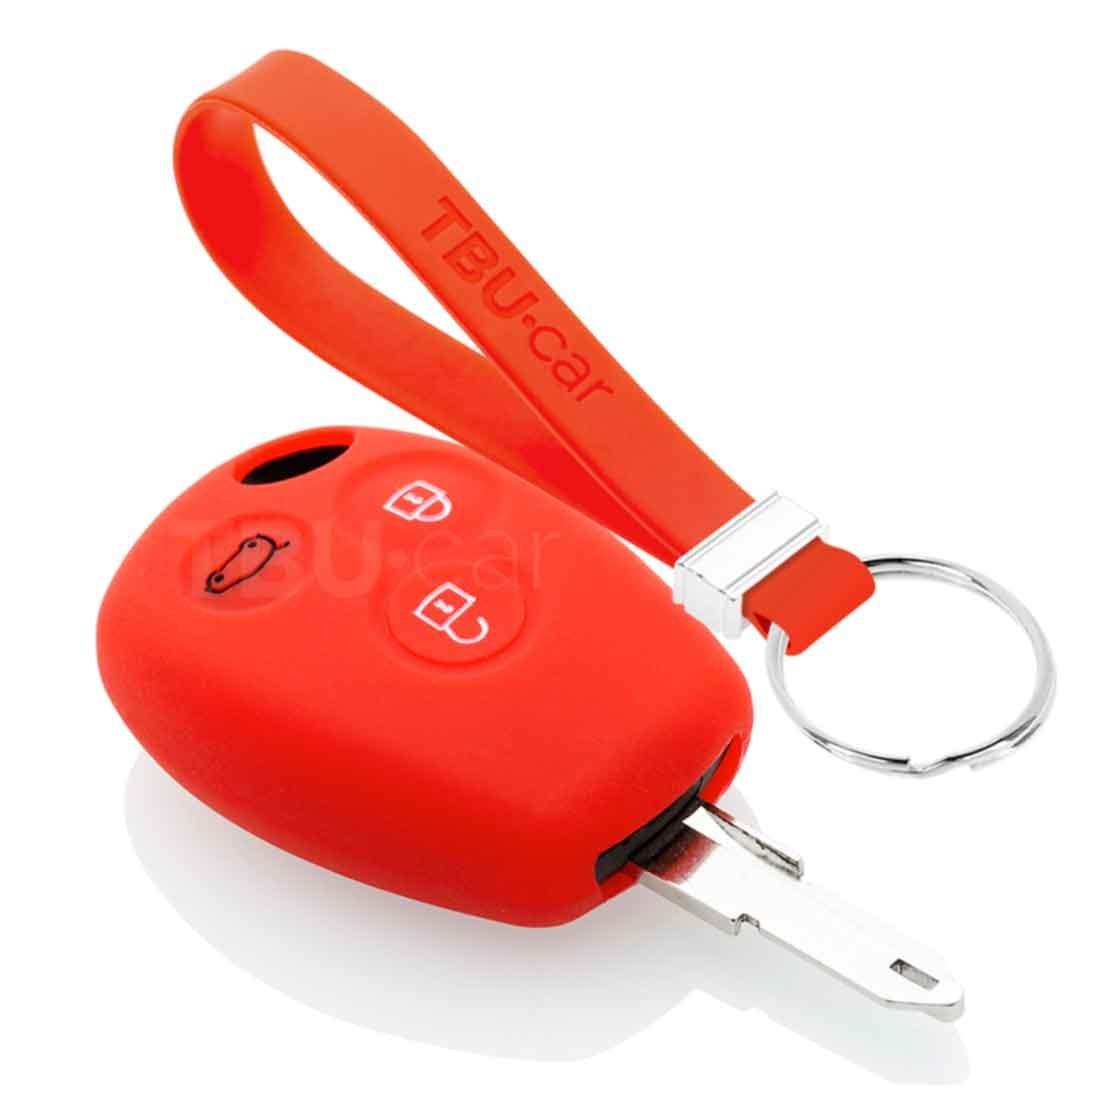 TBU car TBU car Autoschlüssel Hülle kompatibel mit Dacia 3 Tasten - Schutzhülle aus Silikon - Auto Schlüsselhülle Cover in Rott